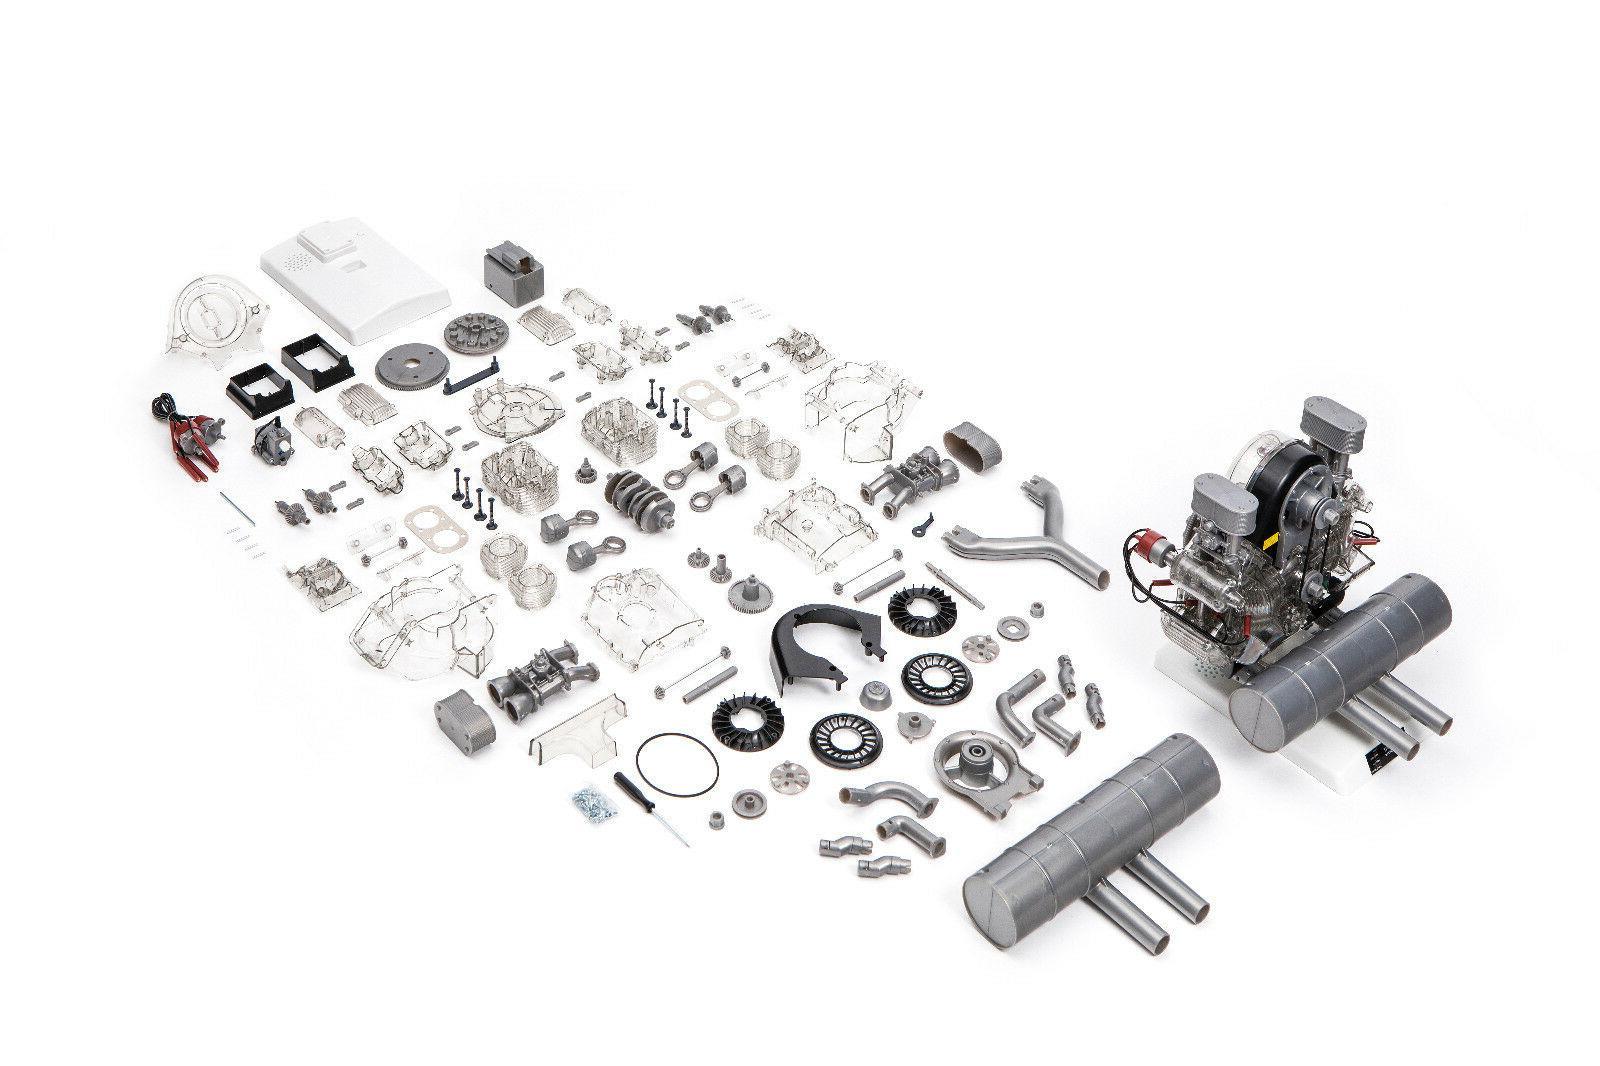 Porsche Model Engine Kit with